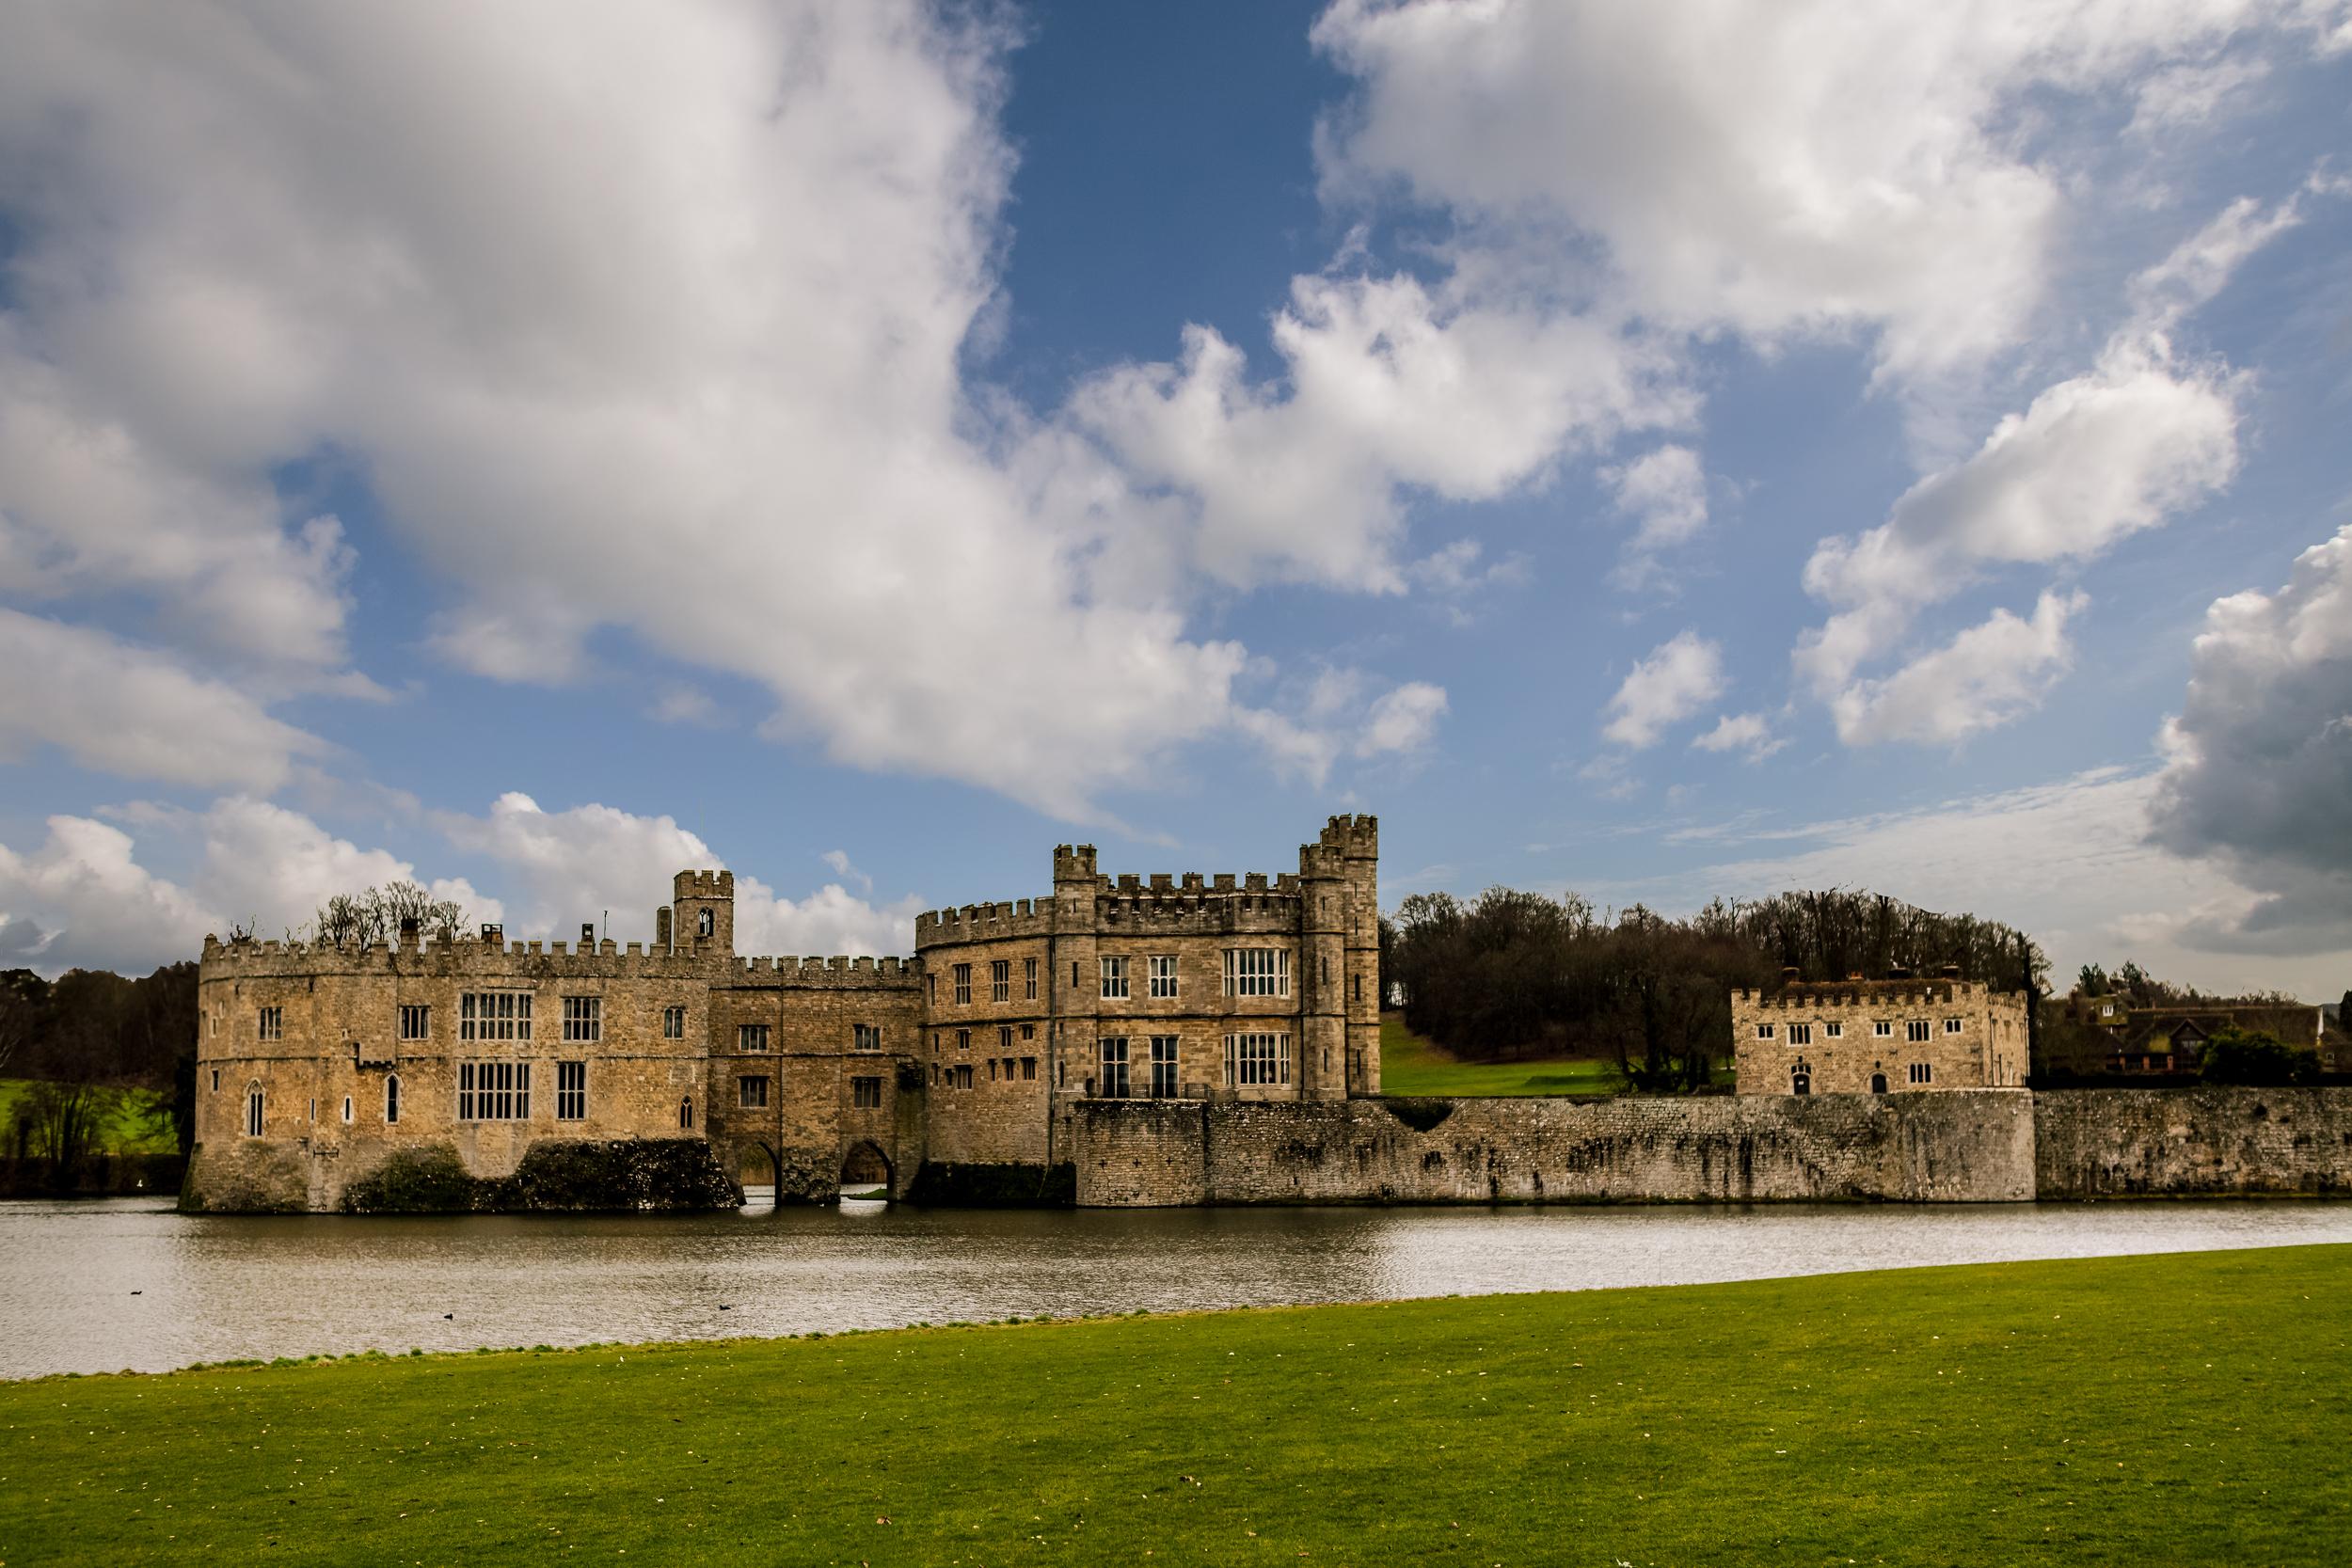 ©Jennifer Bailey 2013 Leeds Castle, England